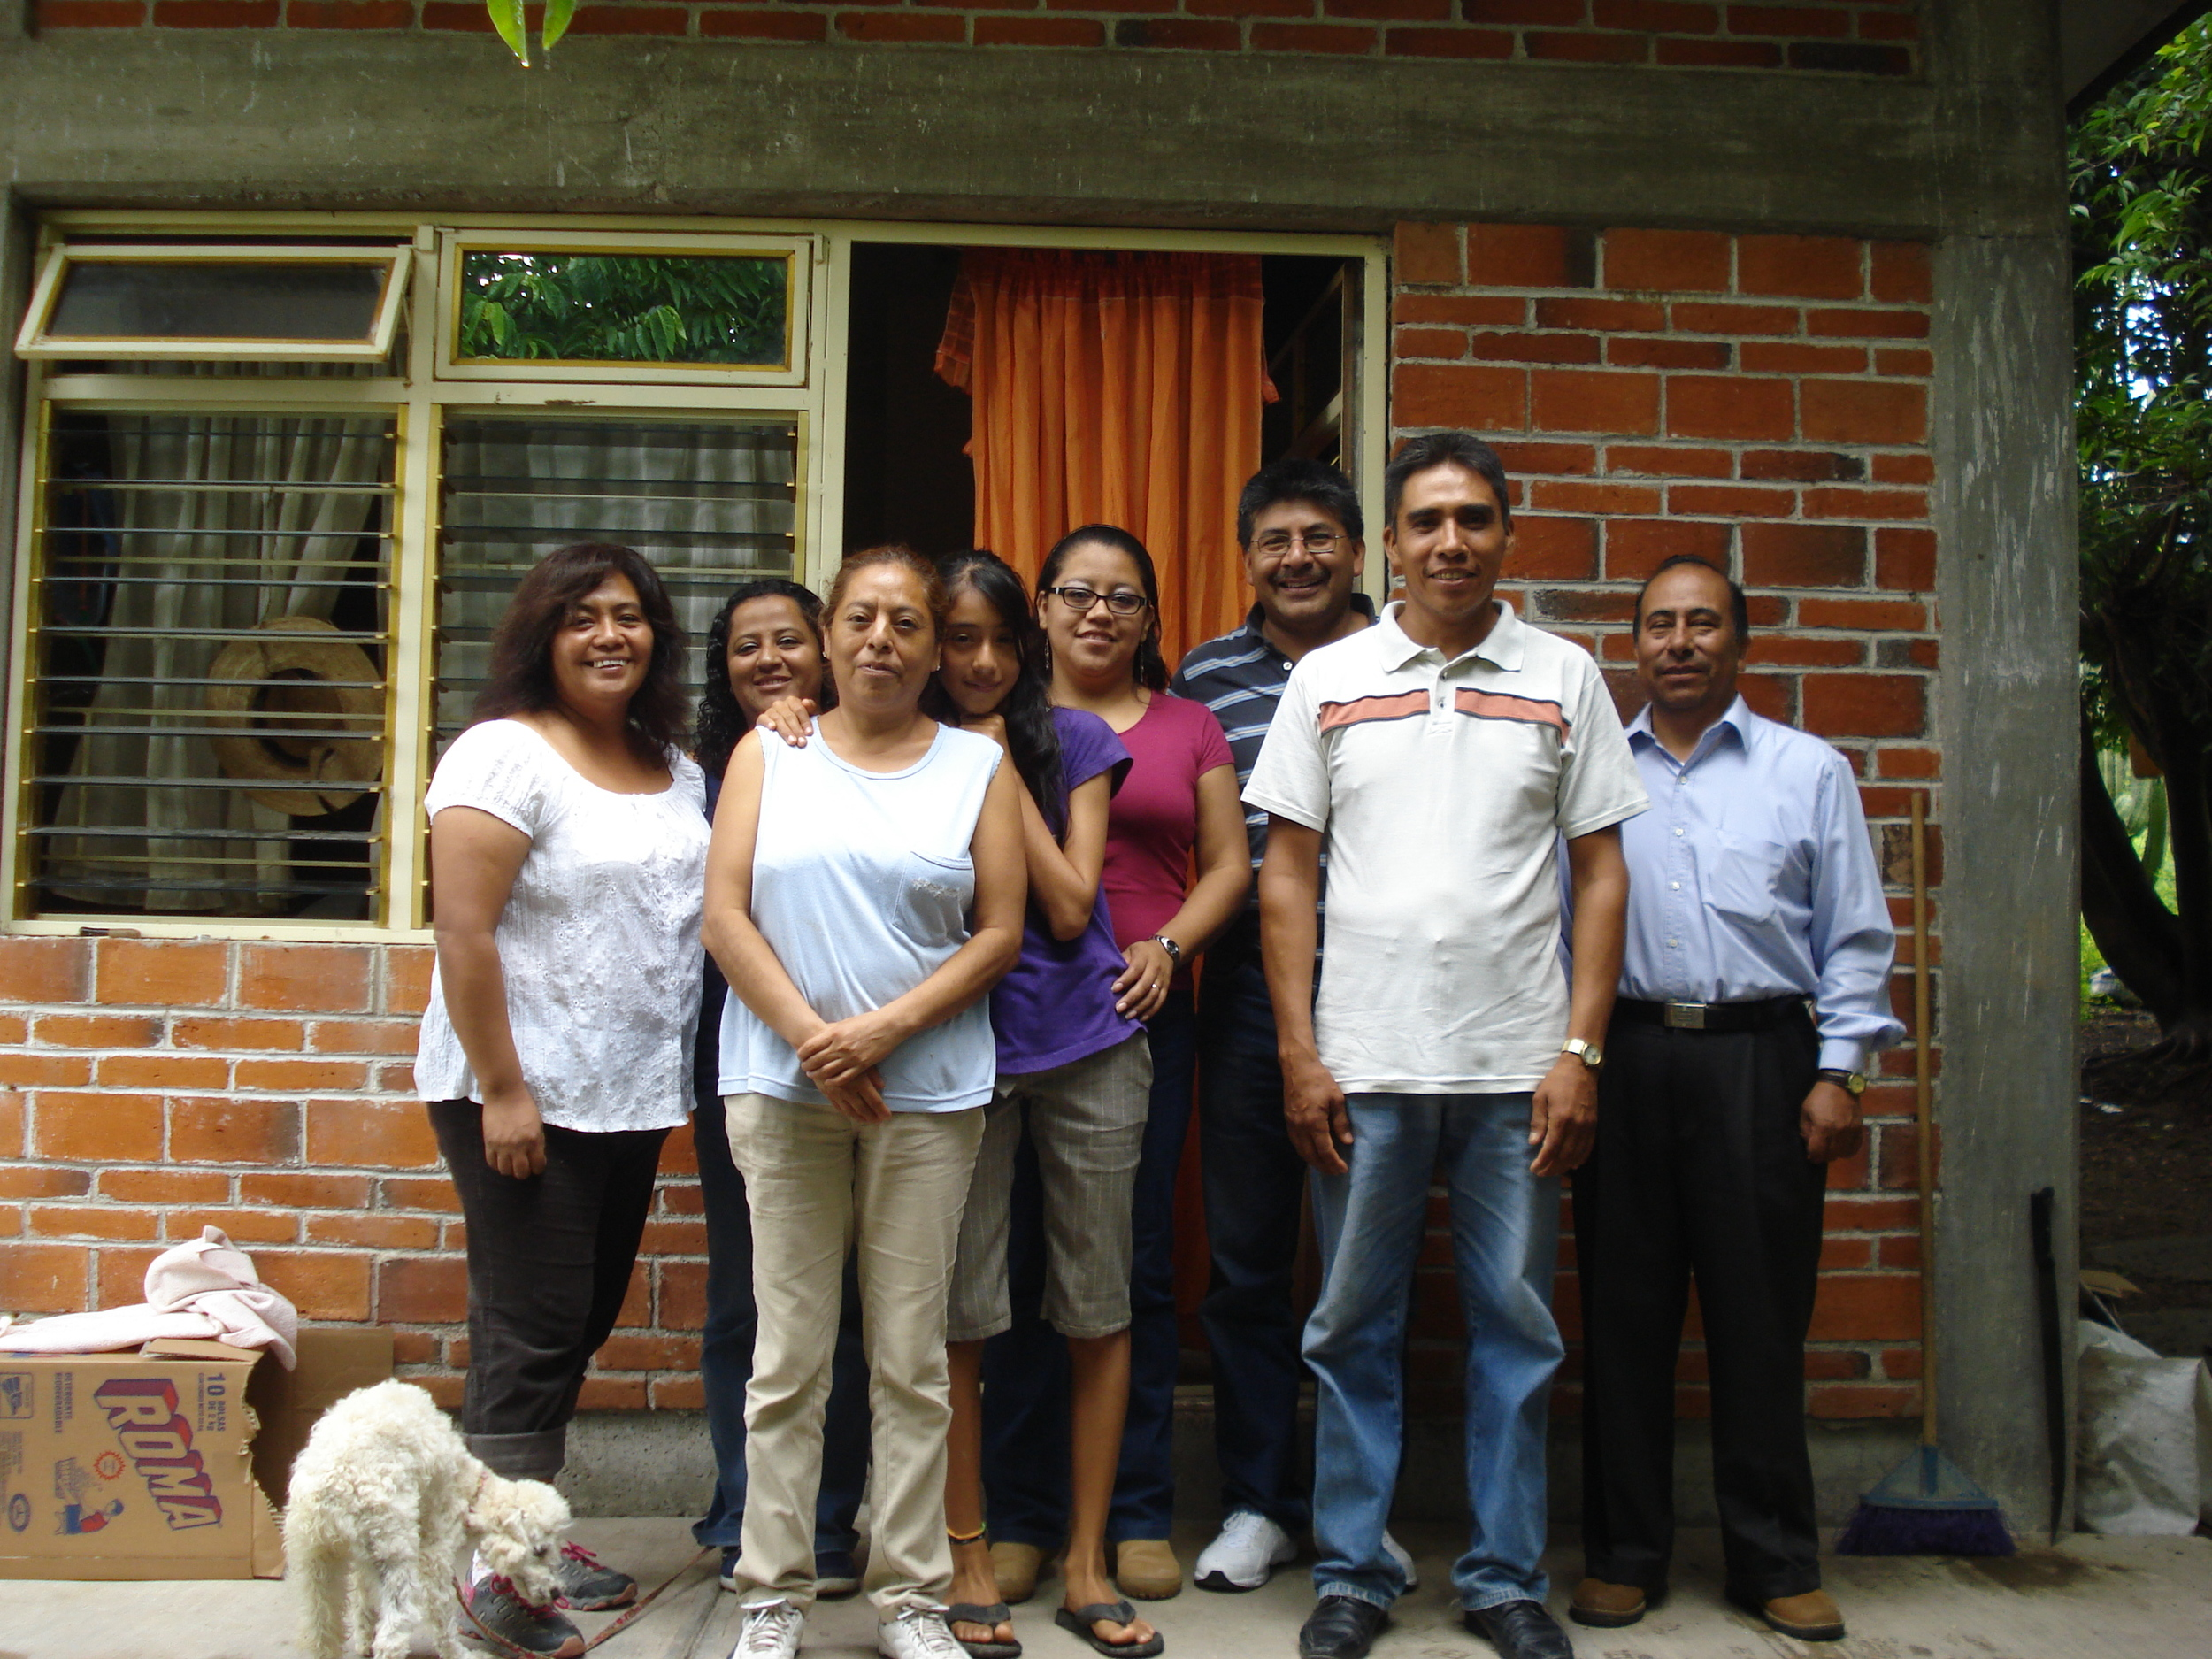 Sara, Belem, Elsa, Zabdi, Ivonne, Manuel, Agapito & Ignacio (Nancy and Noemí are missing from the photo)